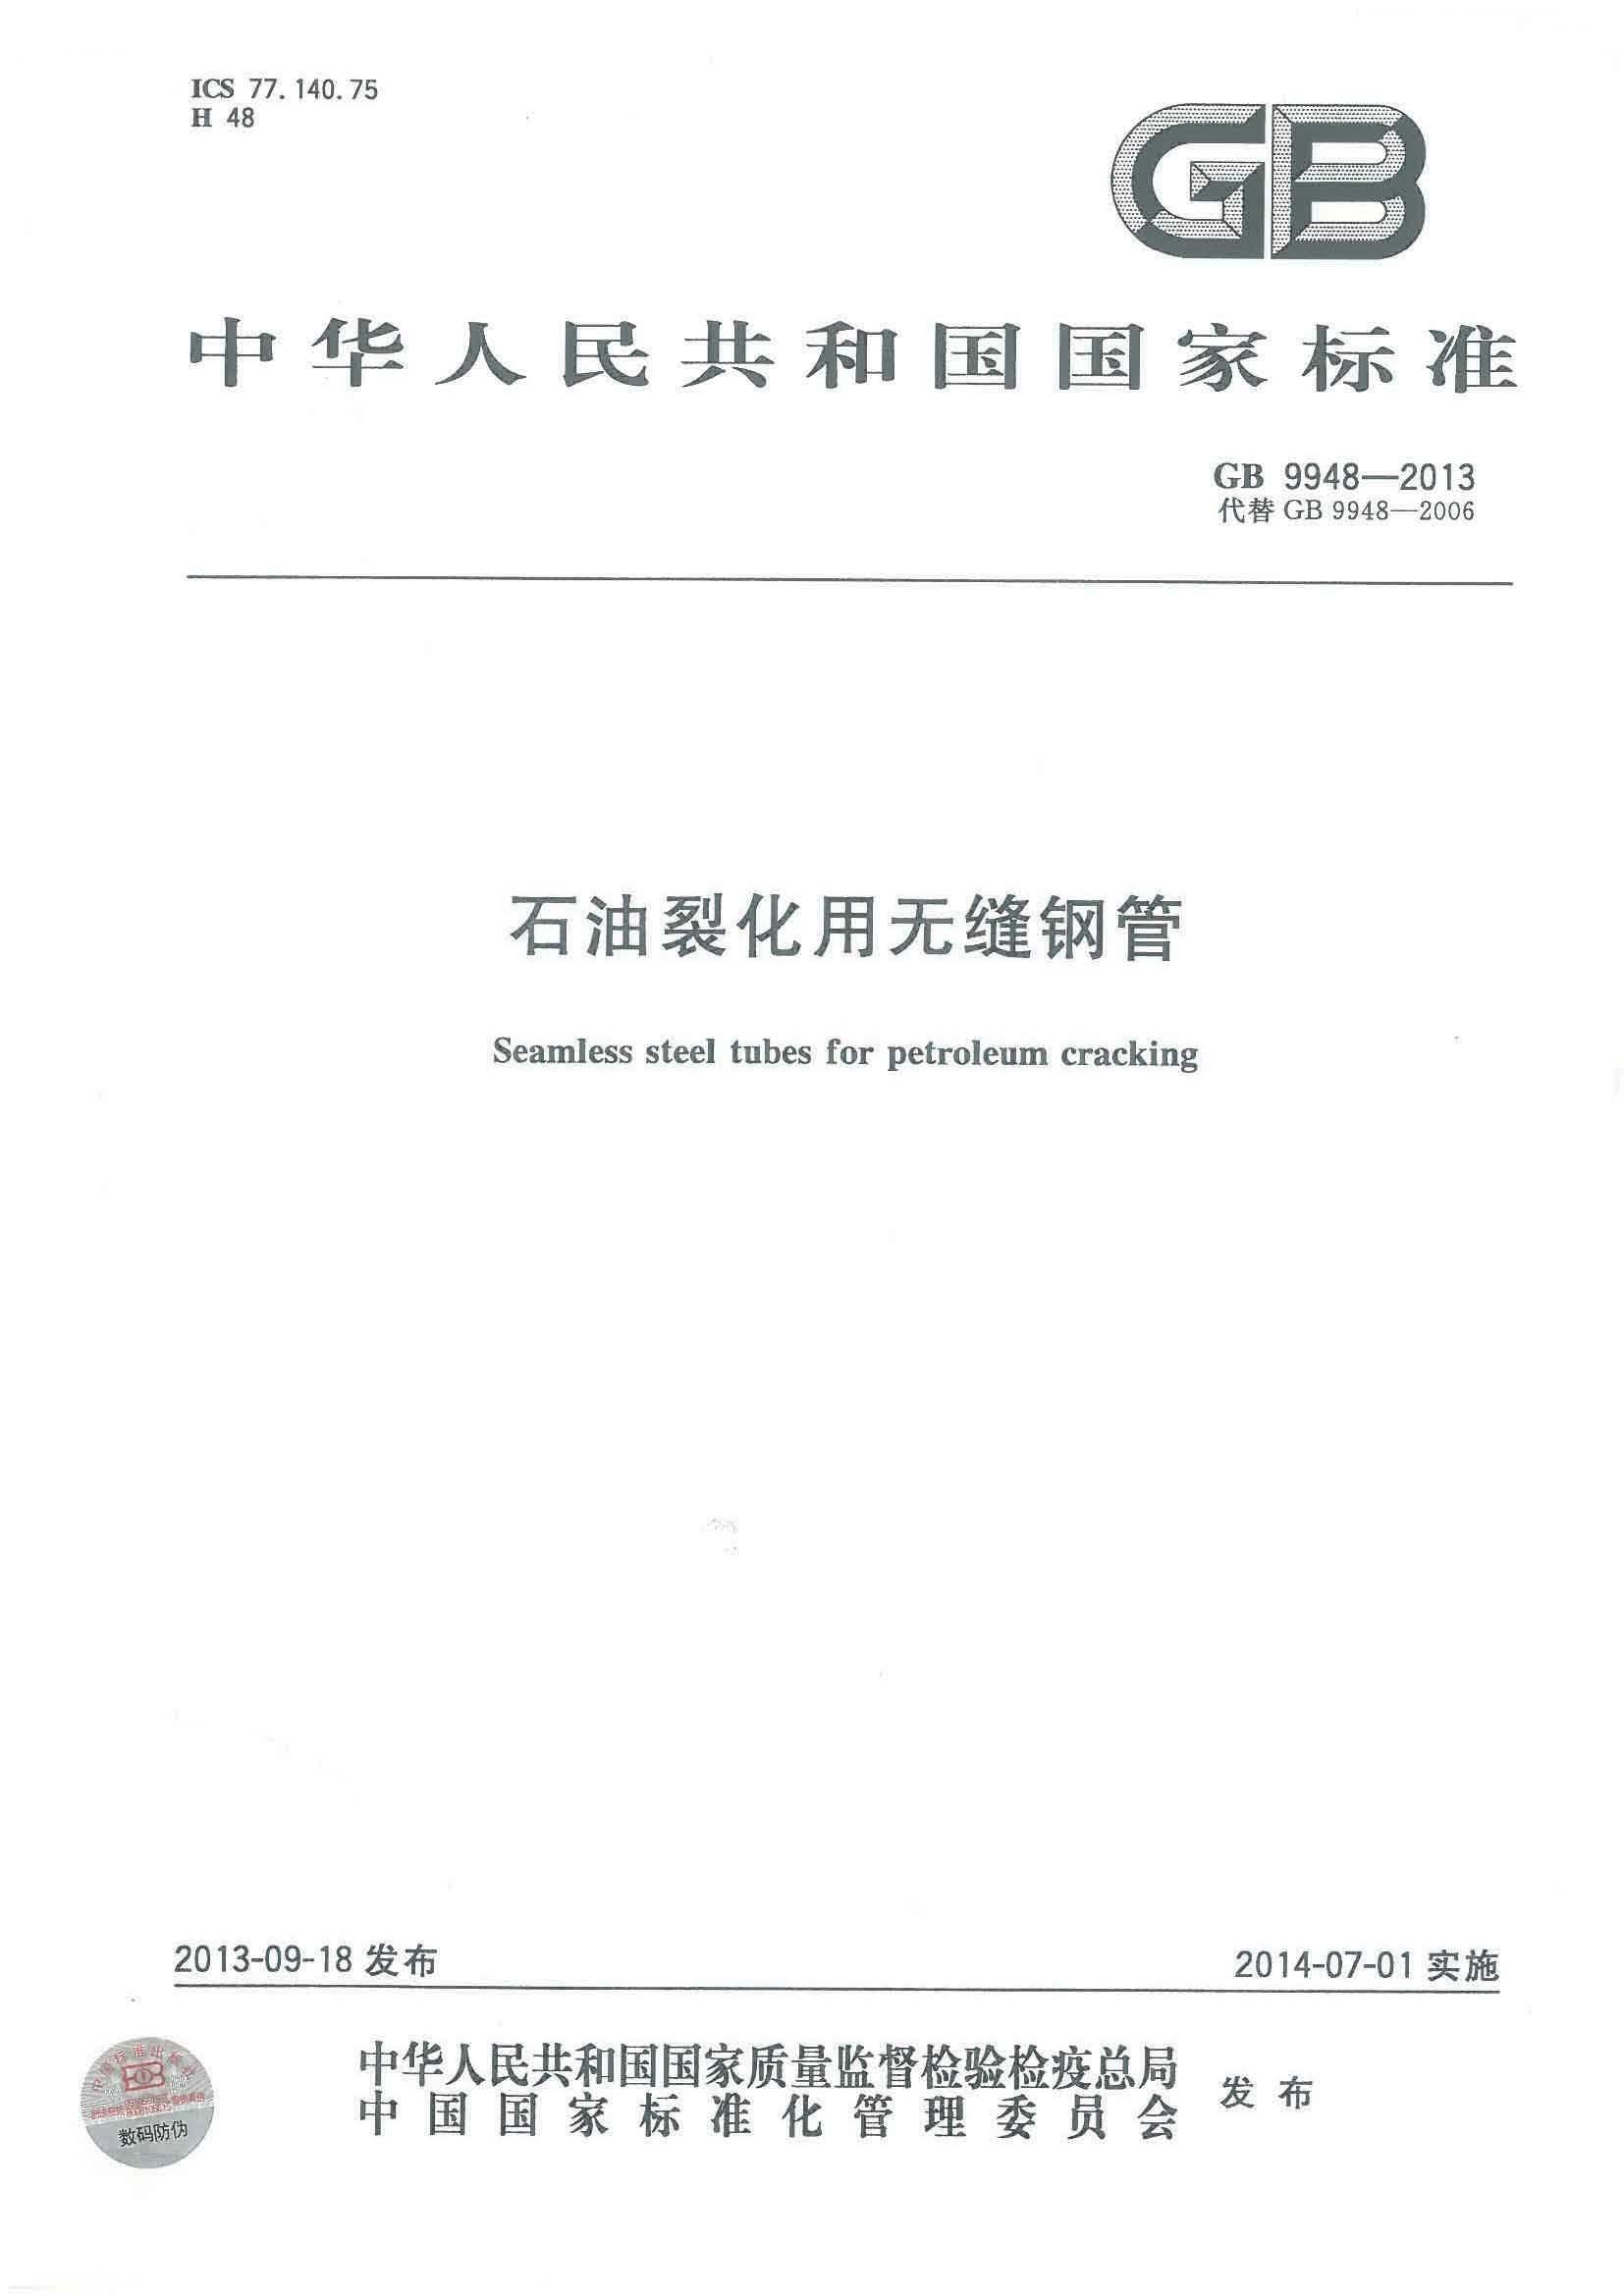 GB 9948-2013标准下载